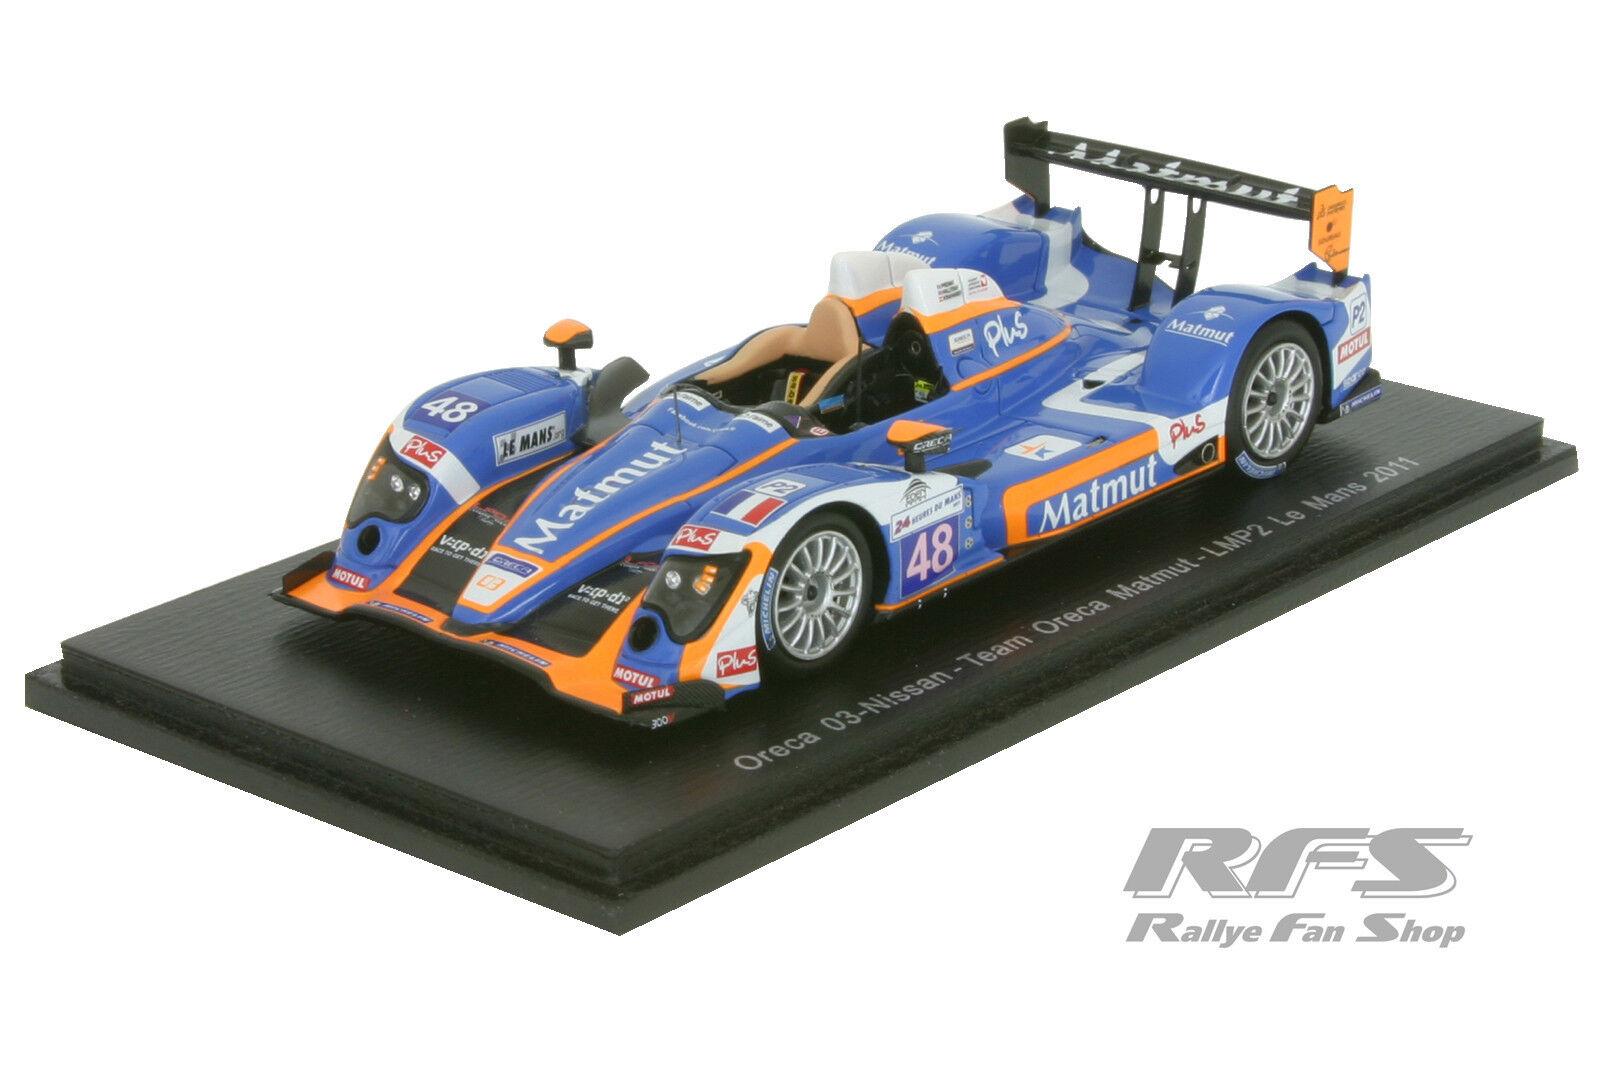 Oreca 03 NISSAN - 24h Le Mans 2011-Team Oreca-Matmut - 1 43 SPARK 4556